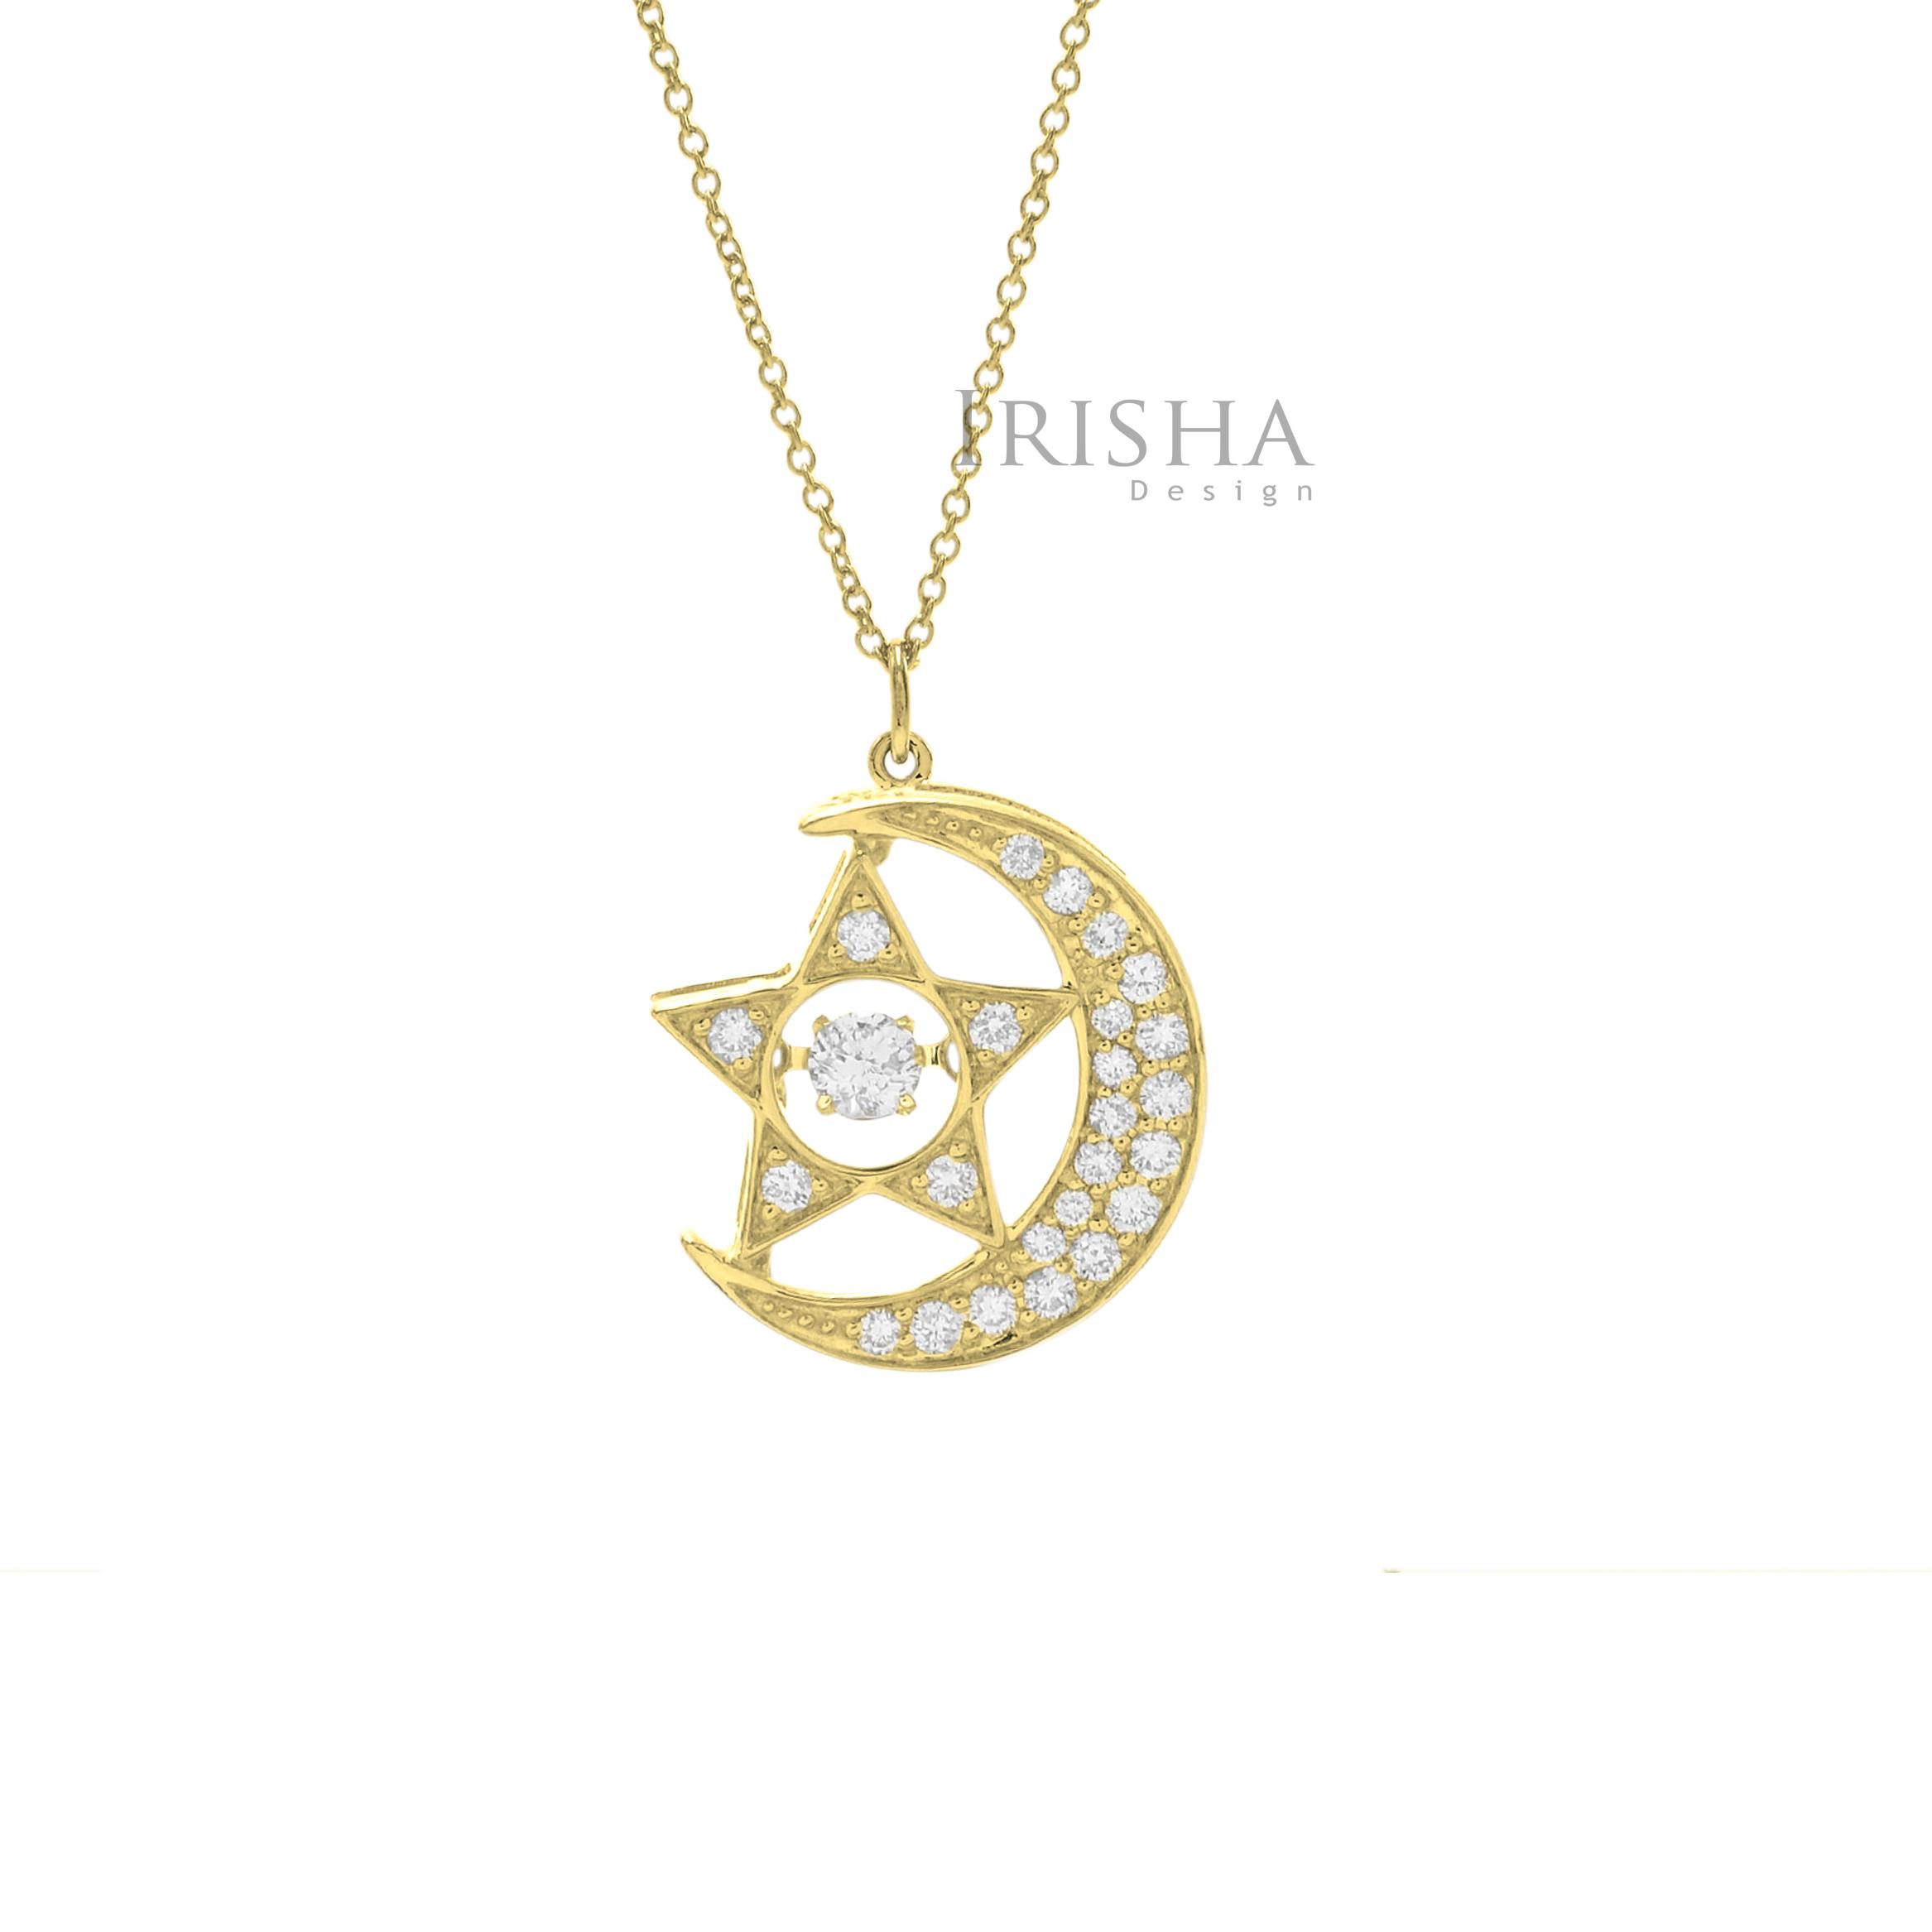 14K Gold 0.28 Ct. Genuine Diamond Crescent Moon Star Charm Necklace Fine Jewelry